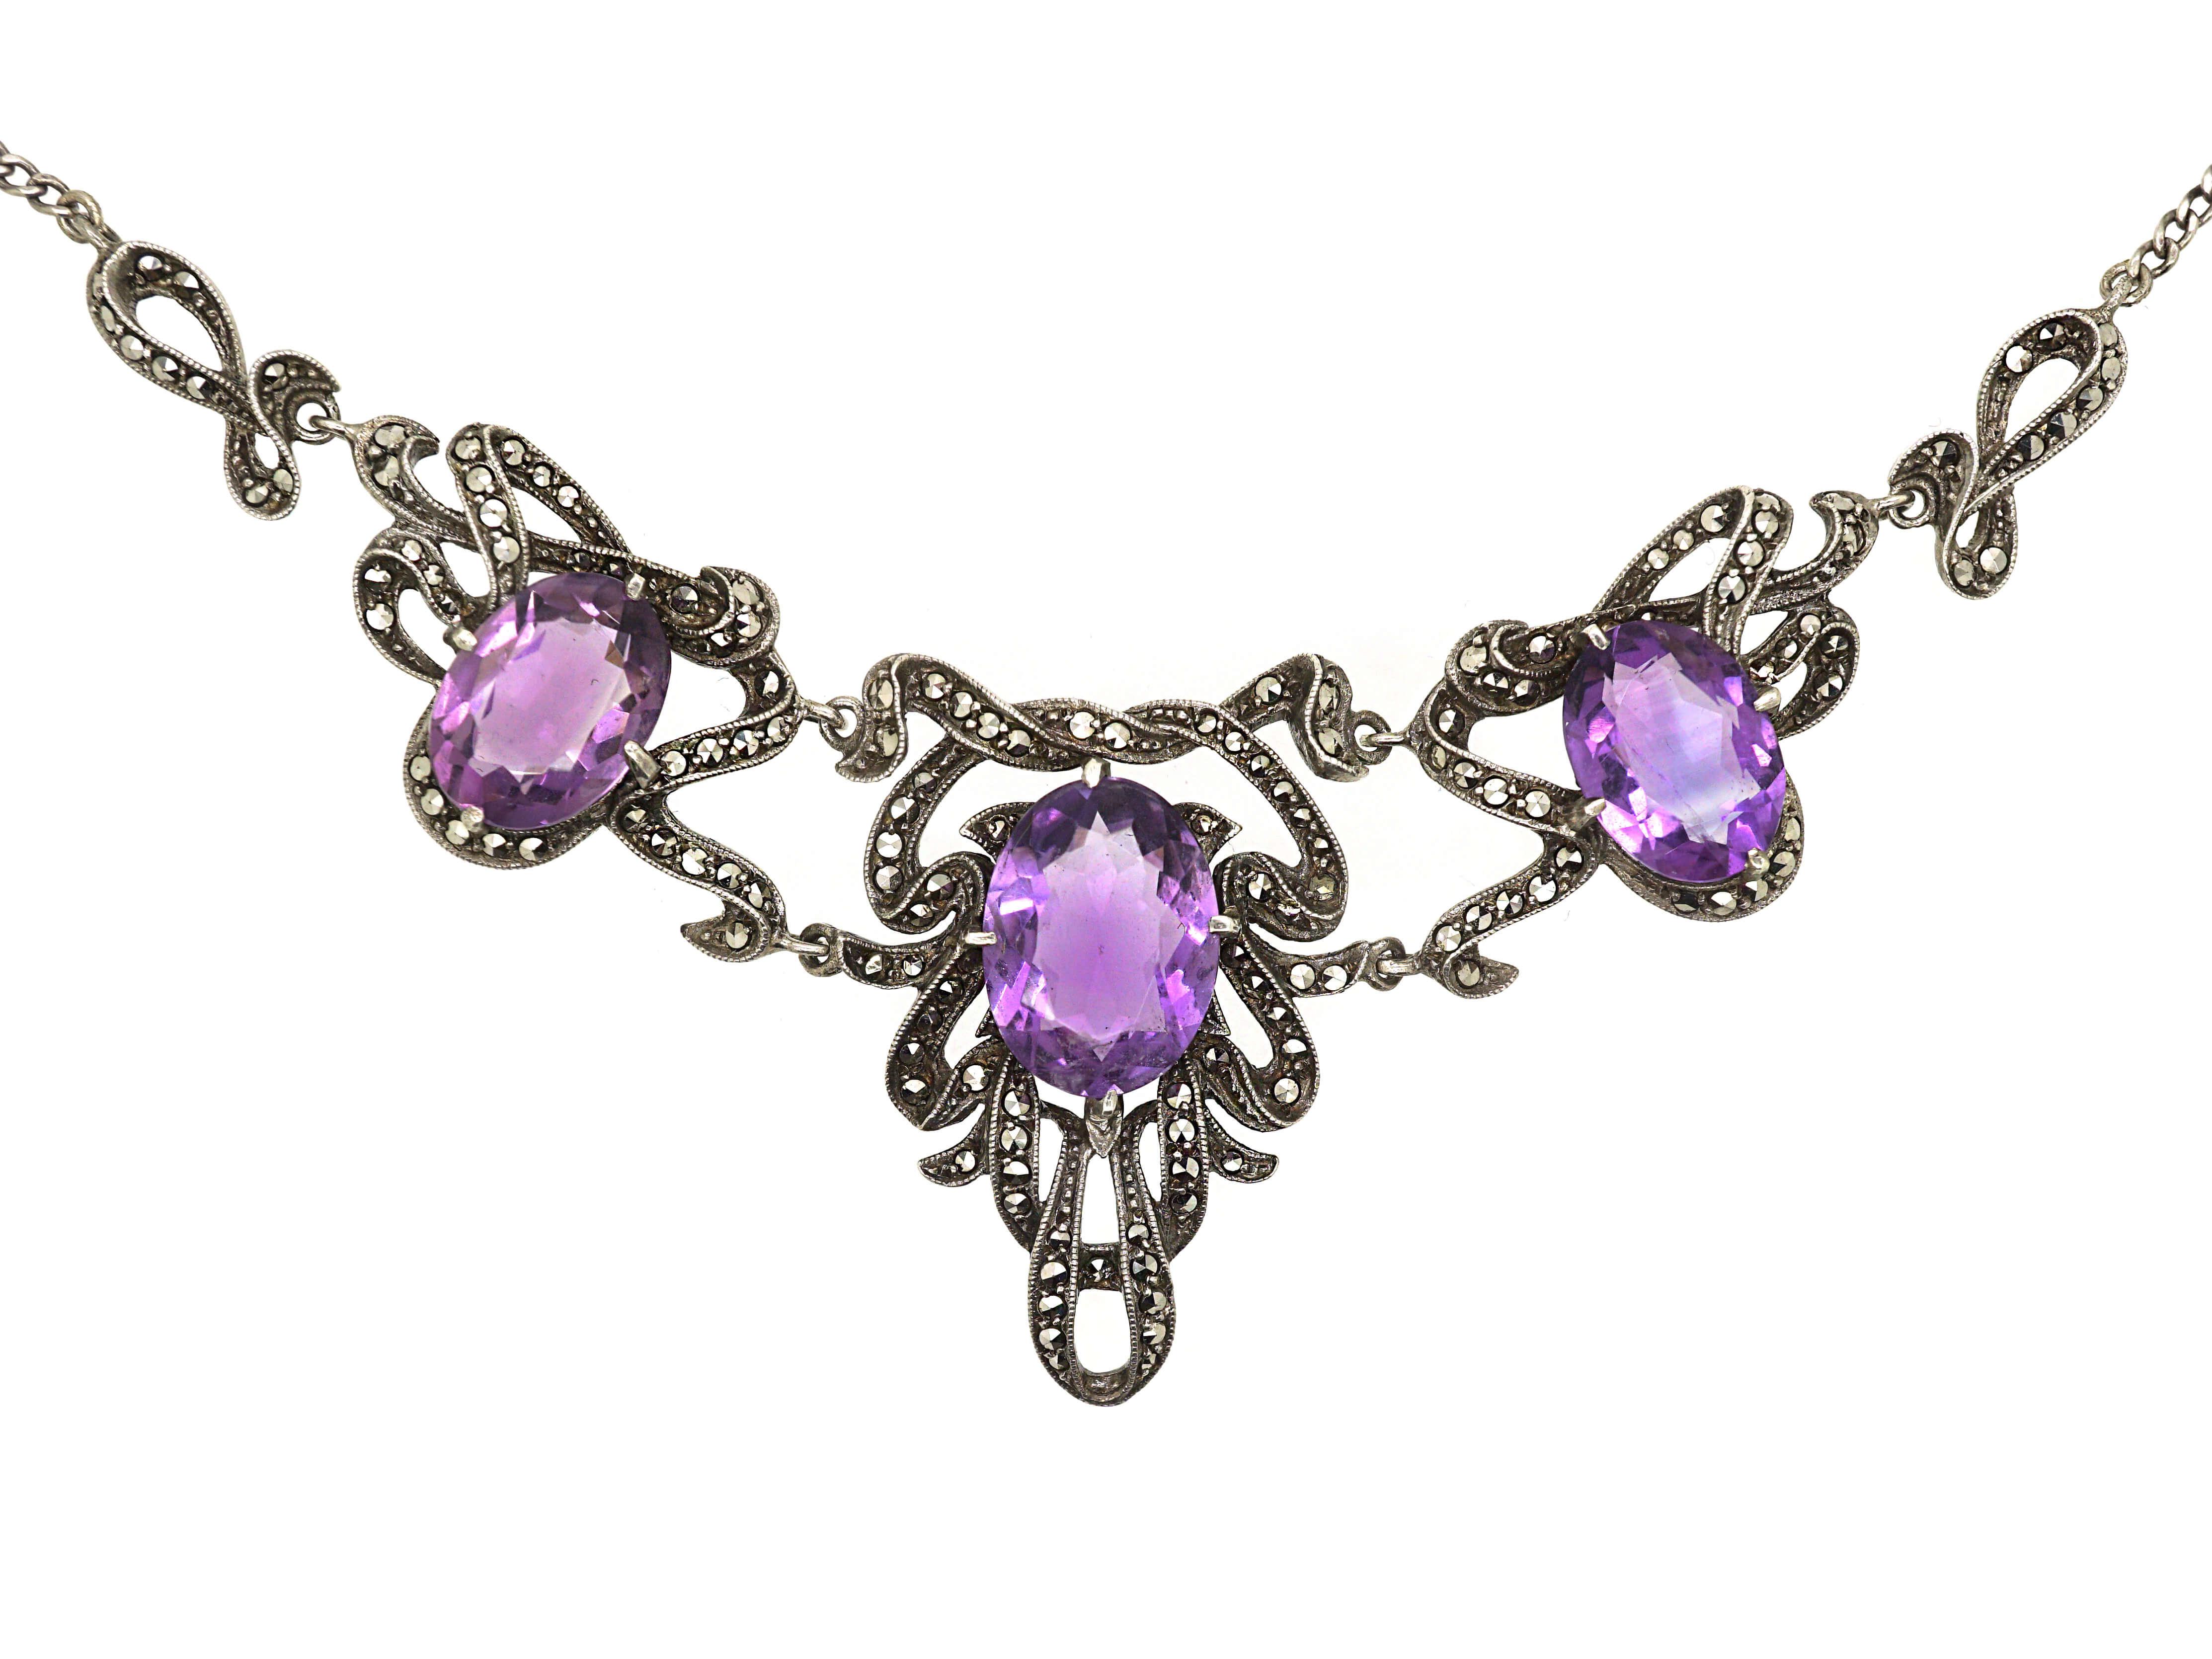 Art Deco Silver, Amethyst & Marcasite Ribbon Design Necklace